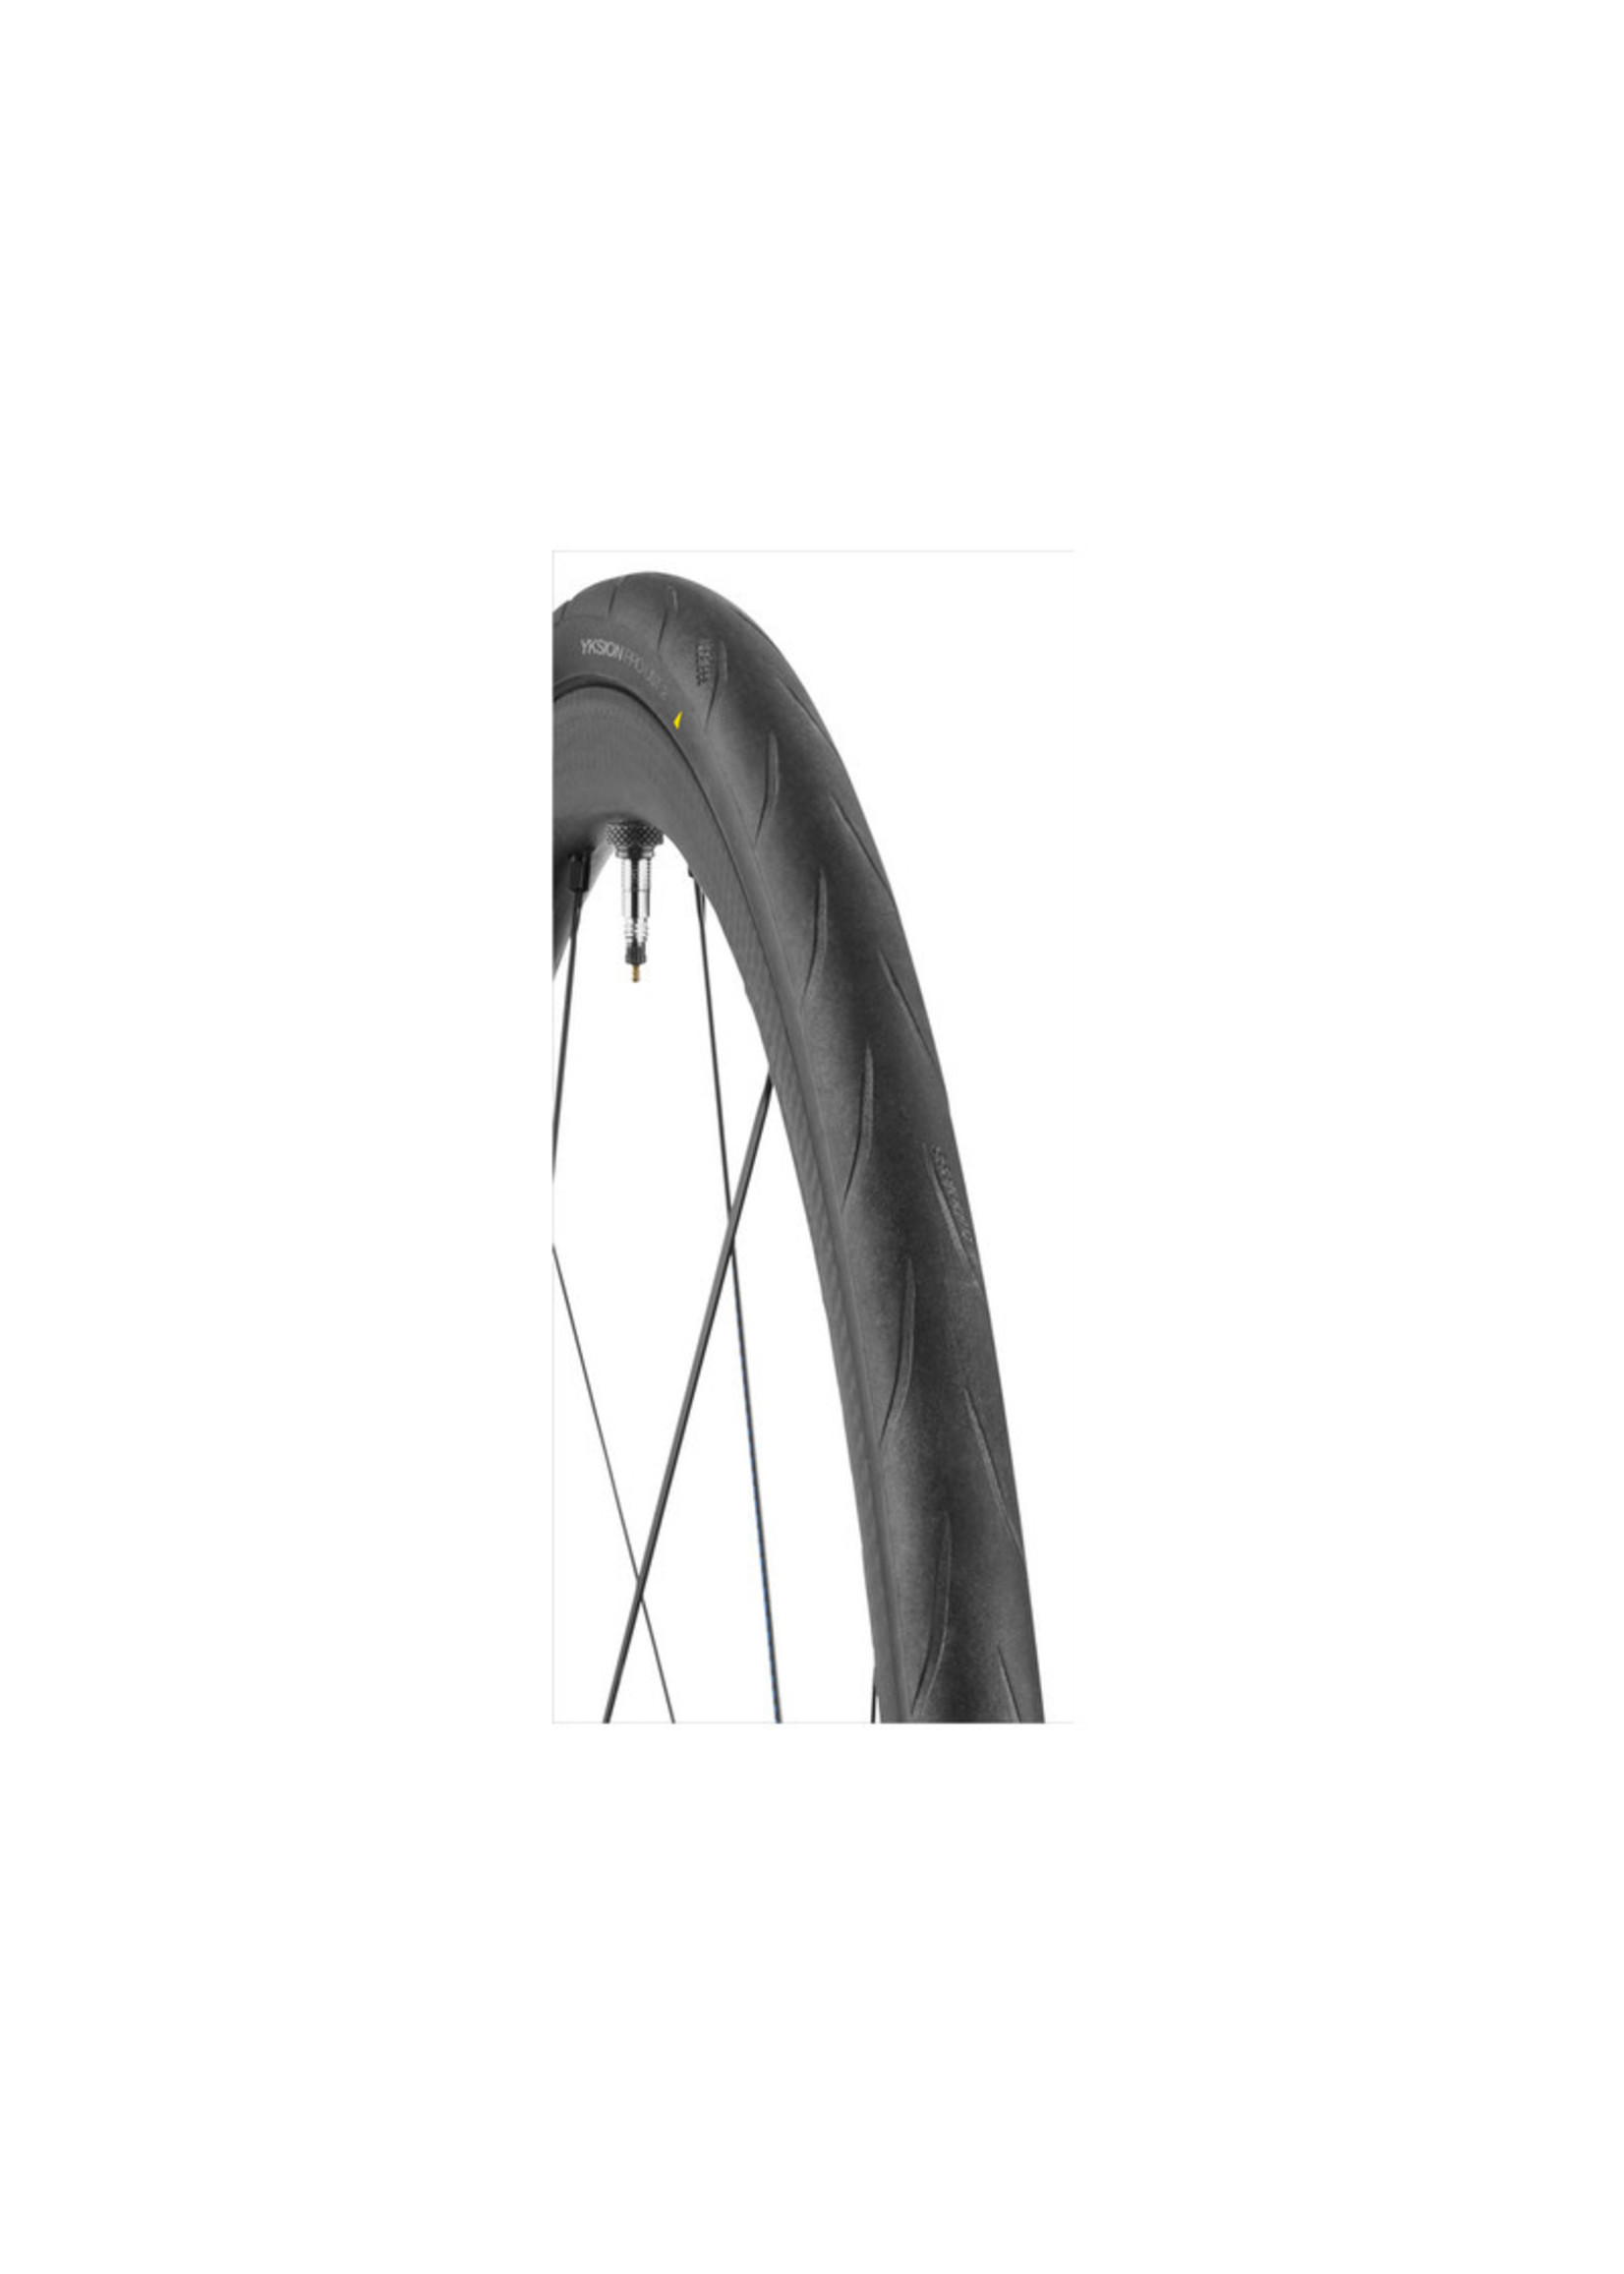 Mavic Yksion Pro UST 19 Noir 25c